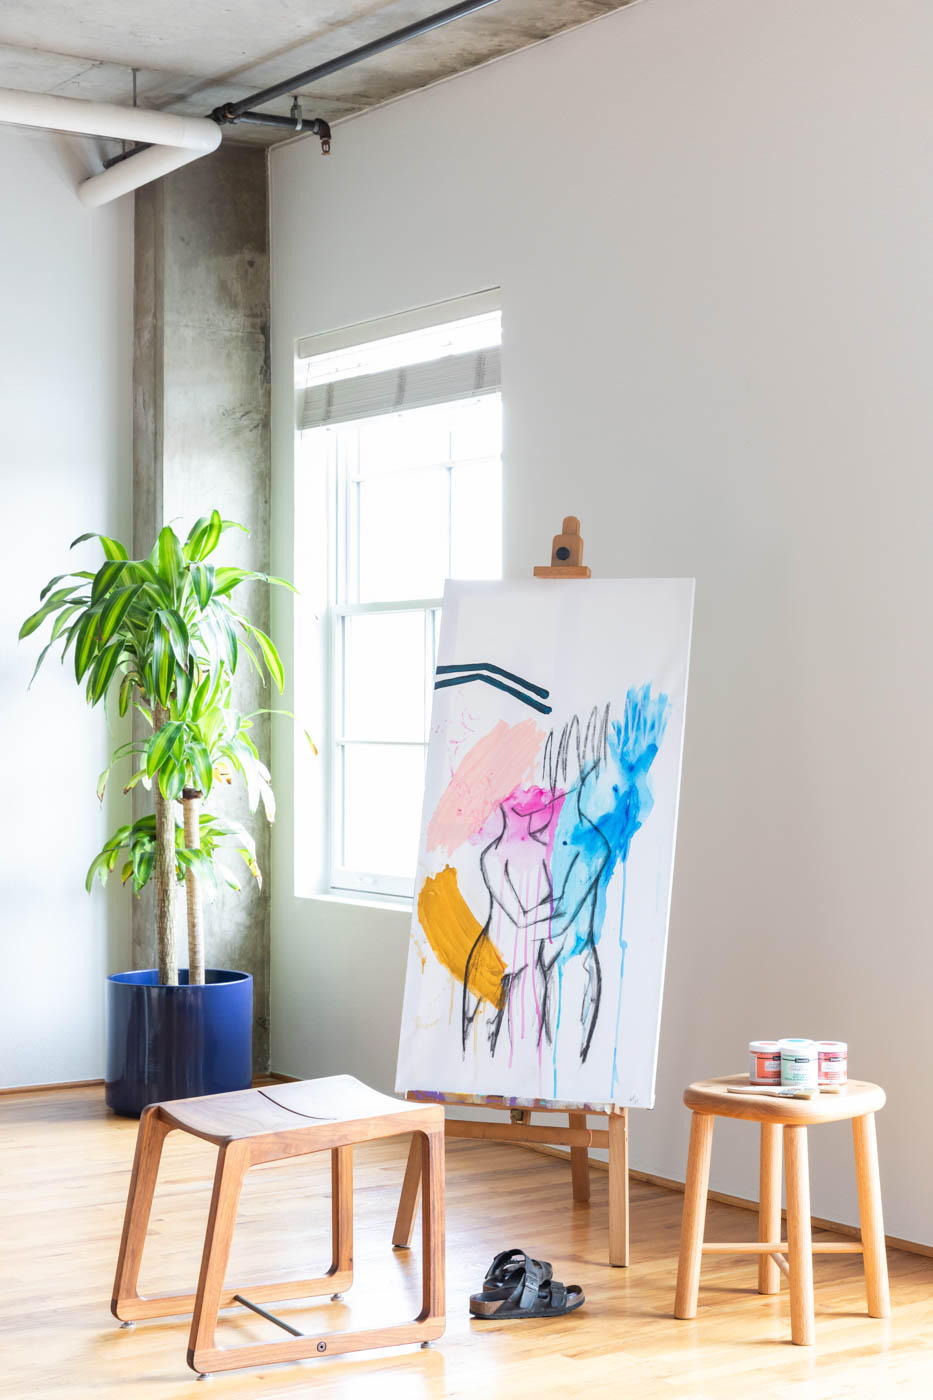 ArtistLoft-DenverCO-natural-light-photography-studio-lifestyle-photoshoot-location-editorial-commercial-photography-4.jpg